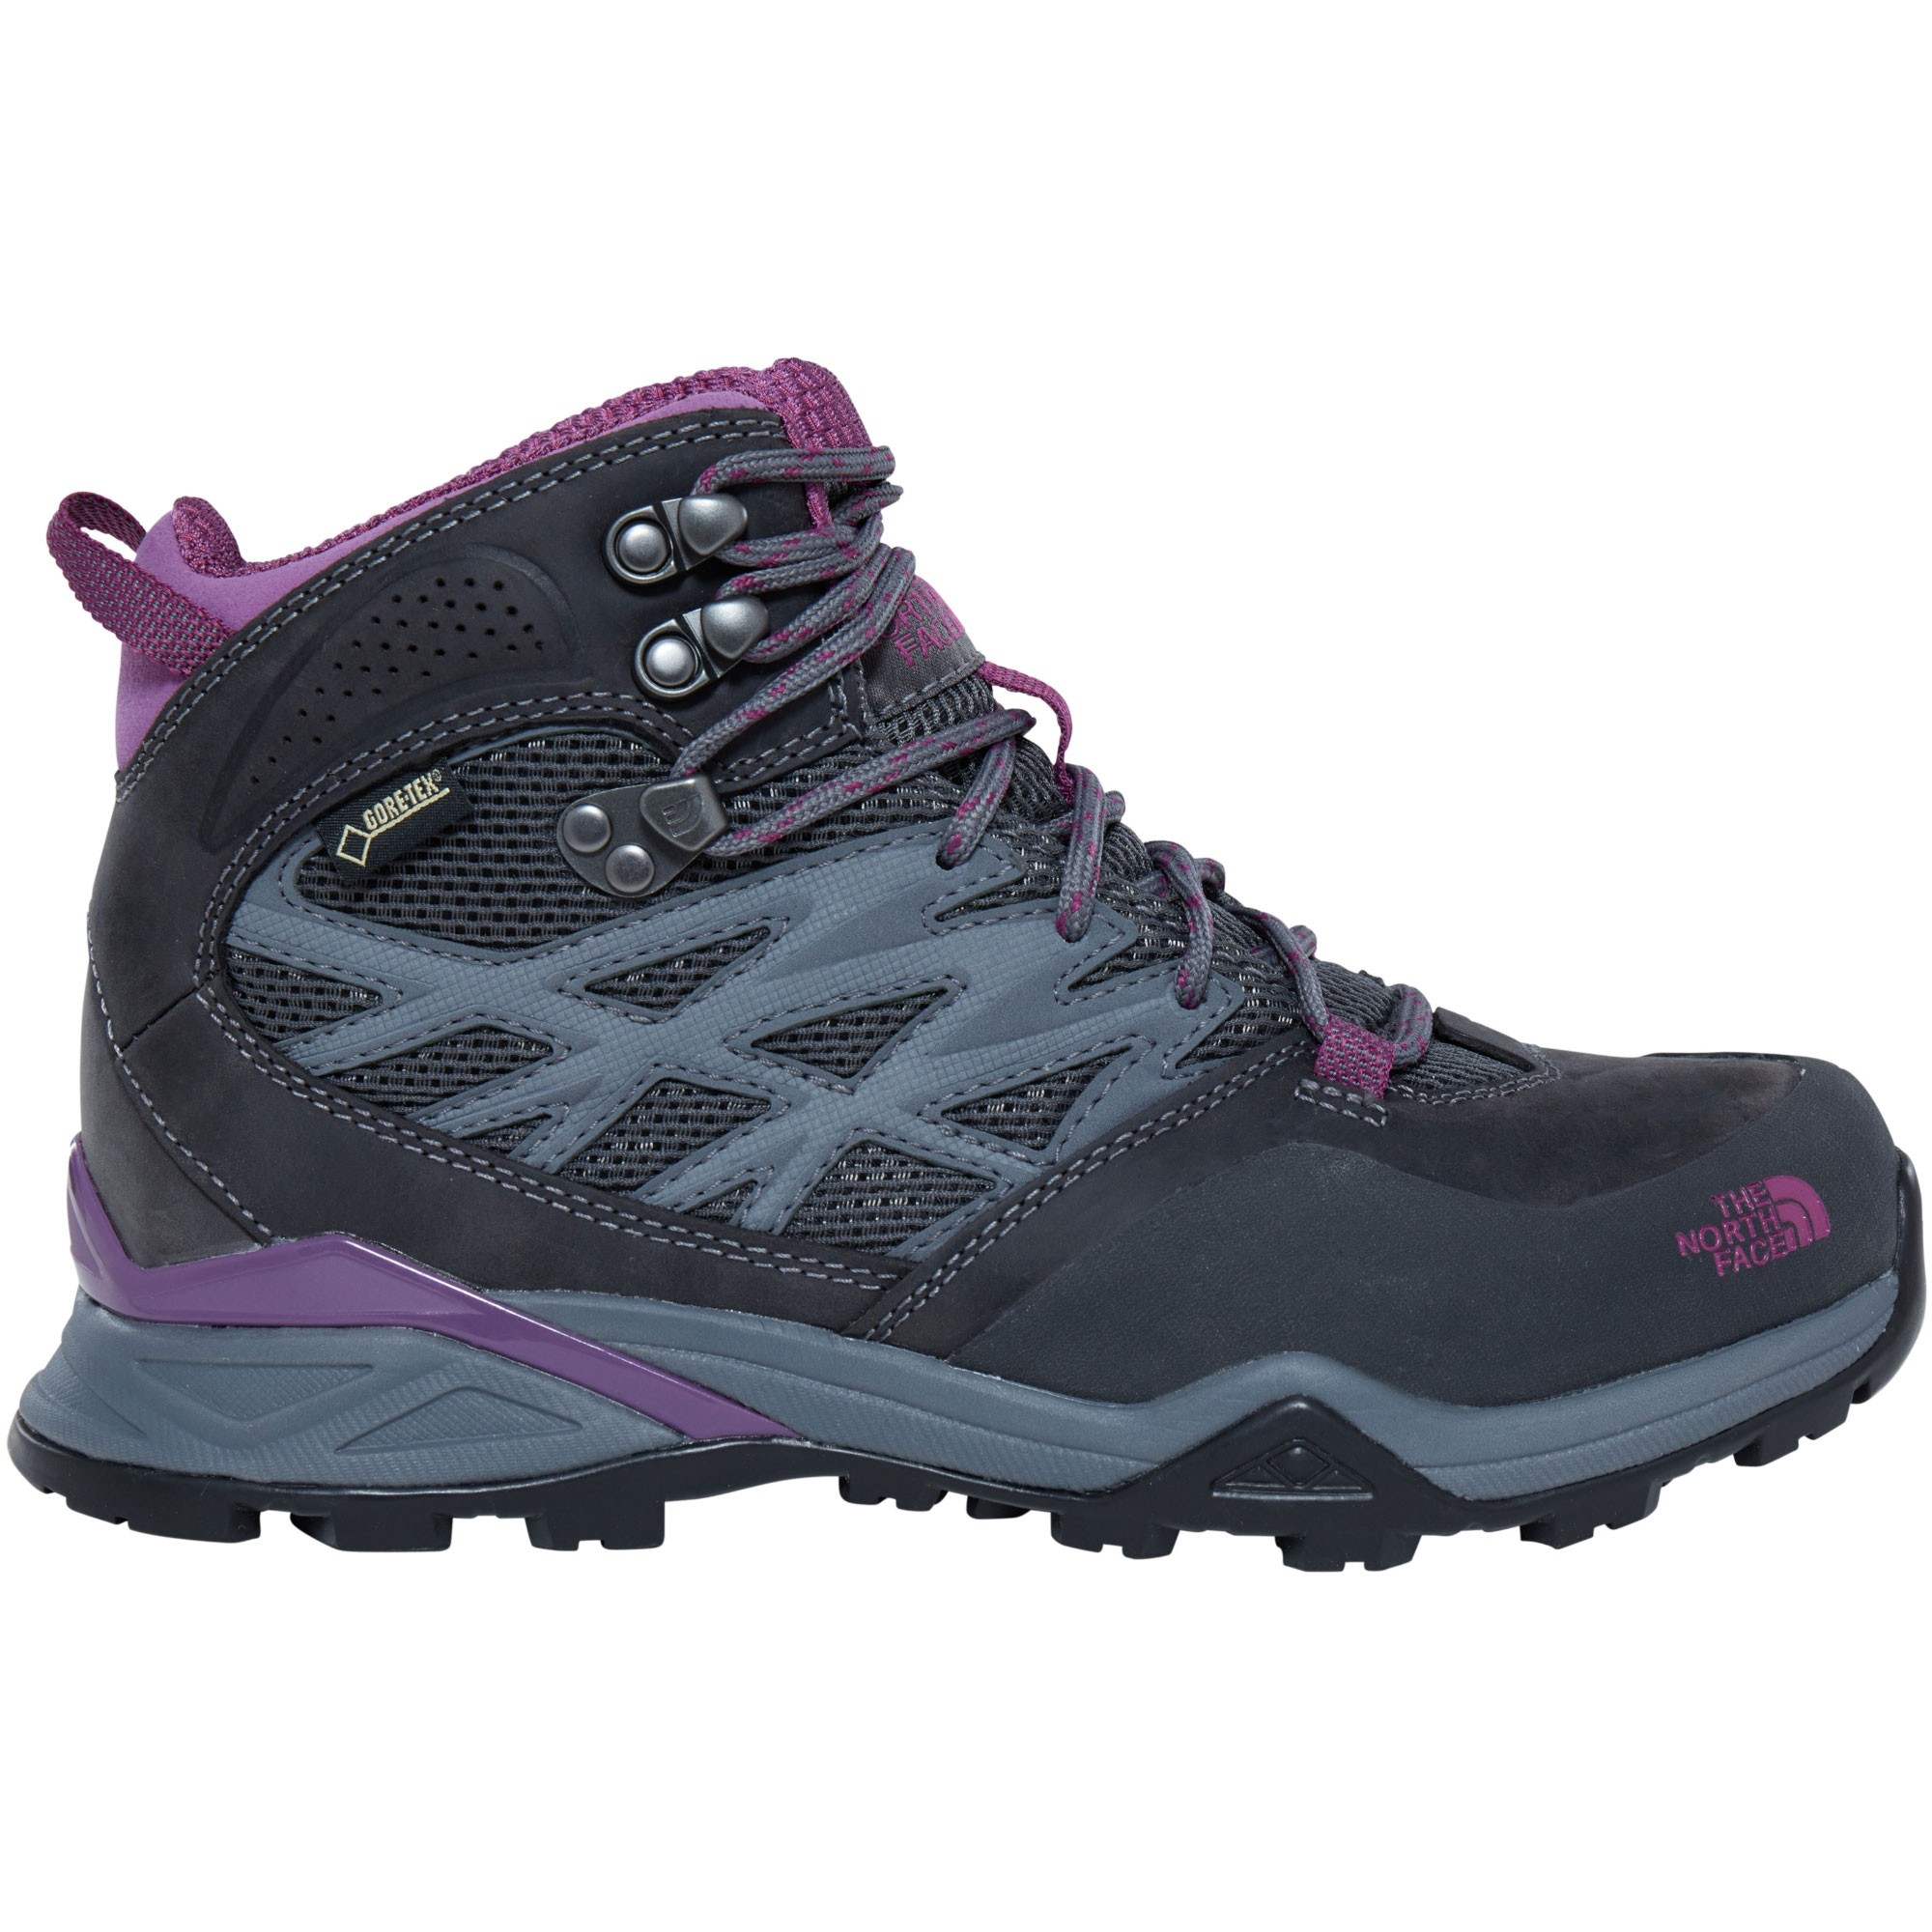 The North Face Women's Hedgehog Hike Mid GTX - Dark Shadow Grey/Woodland Violet